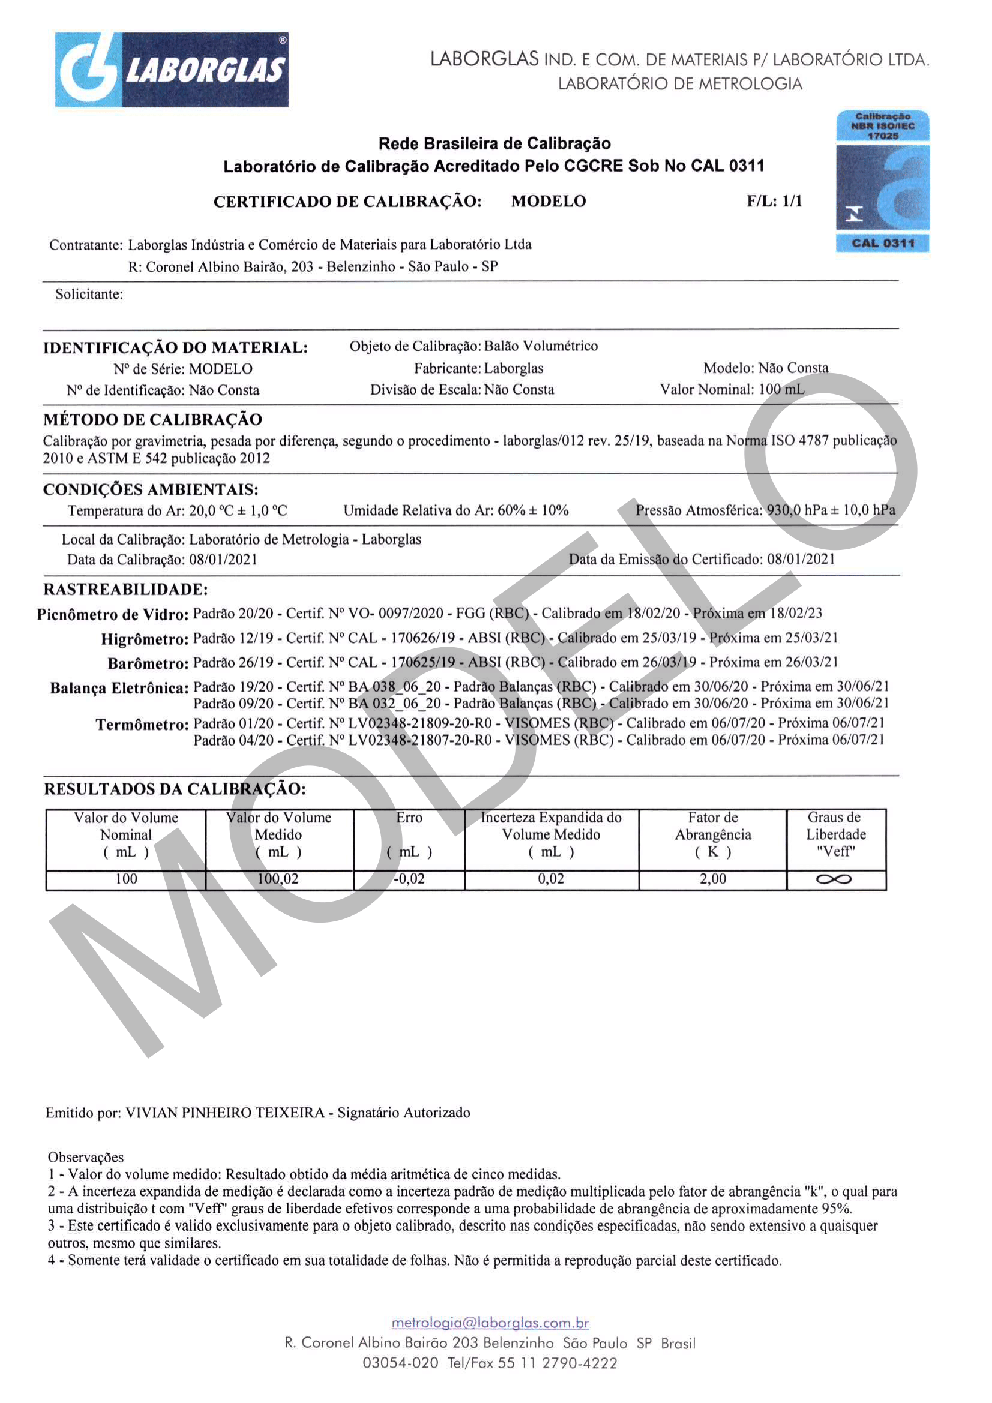 BALÃO VOLUMÉTRICO CLASSE A ROLHA POLI ÂMBAR C/ CERTIFICADO RBC 1000 ML - Marca Laborglas - Cód. 91678546-R